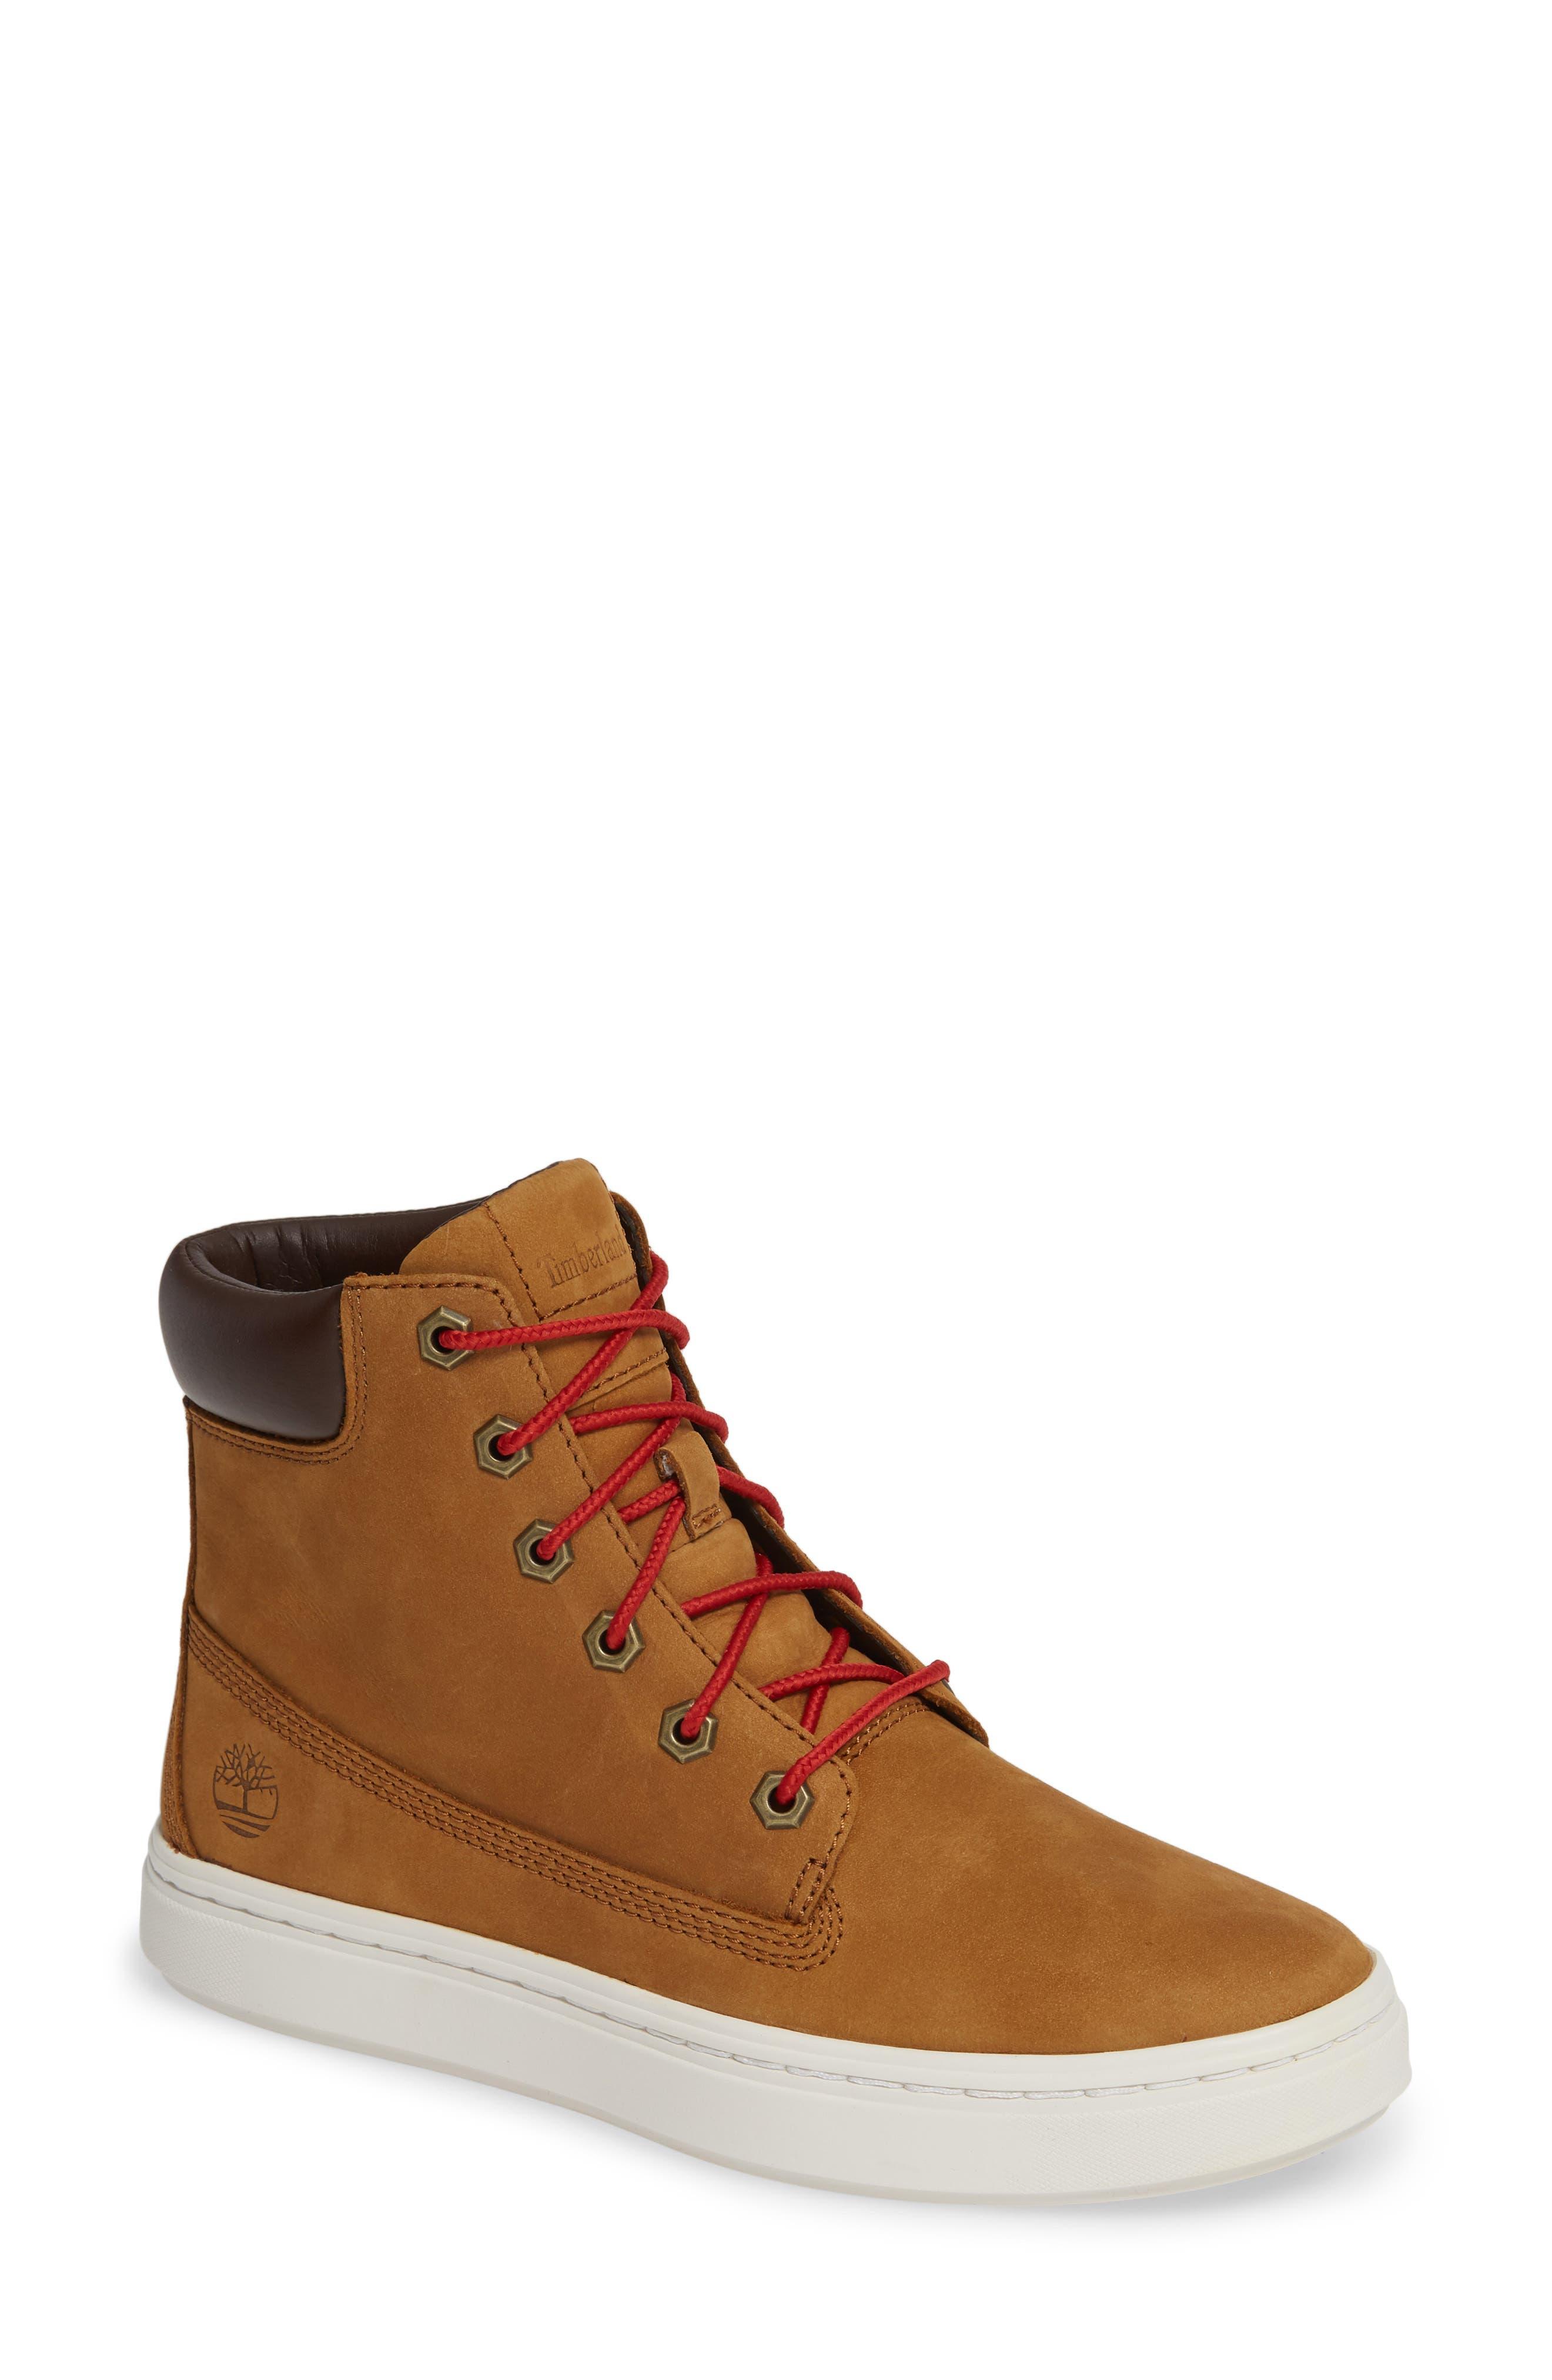 Londyn Boot,                         Main,                         color, TRAPPER TAN NUBUCK